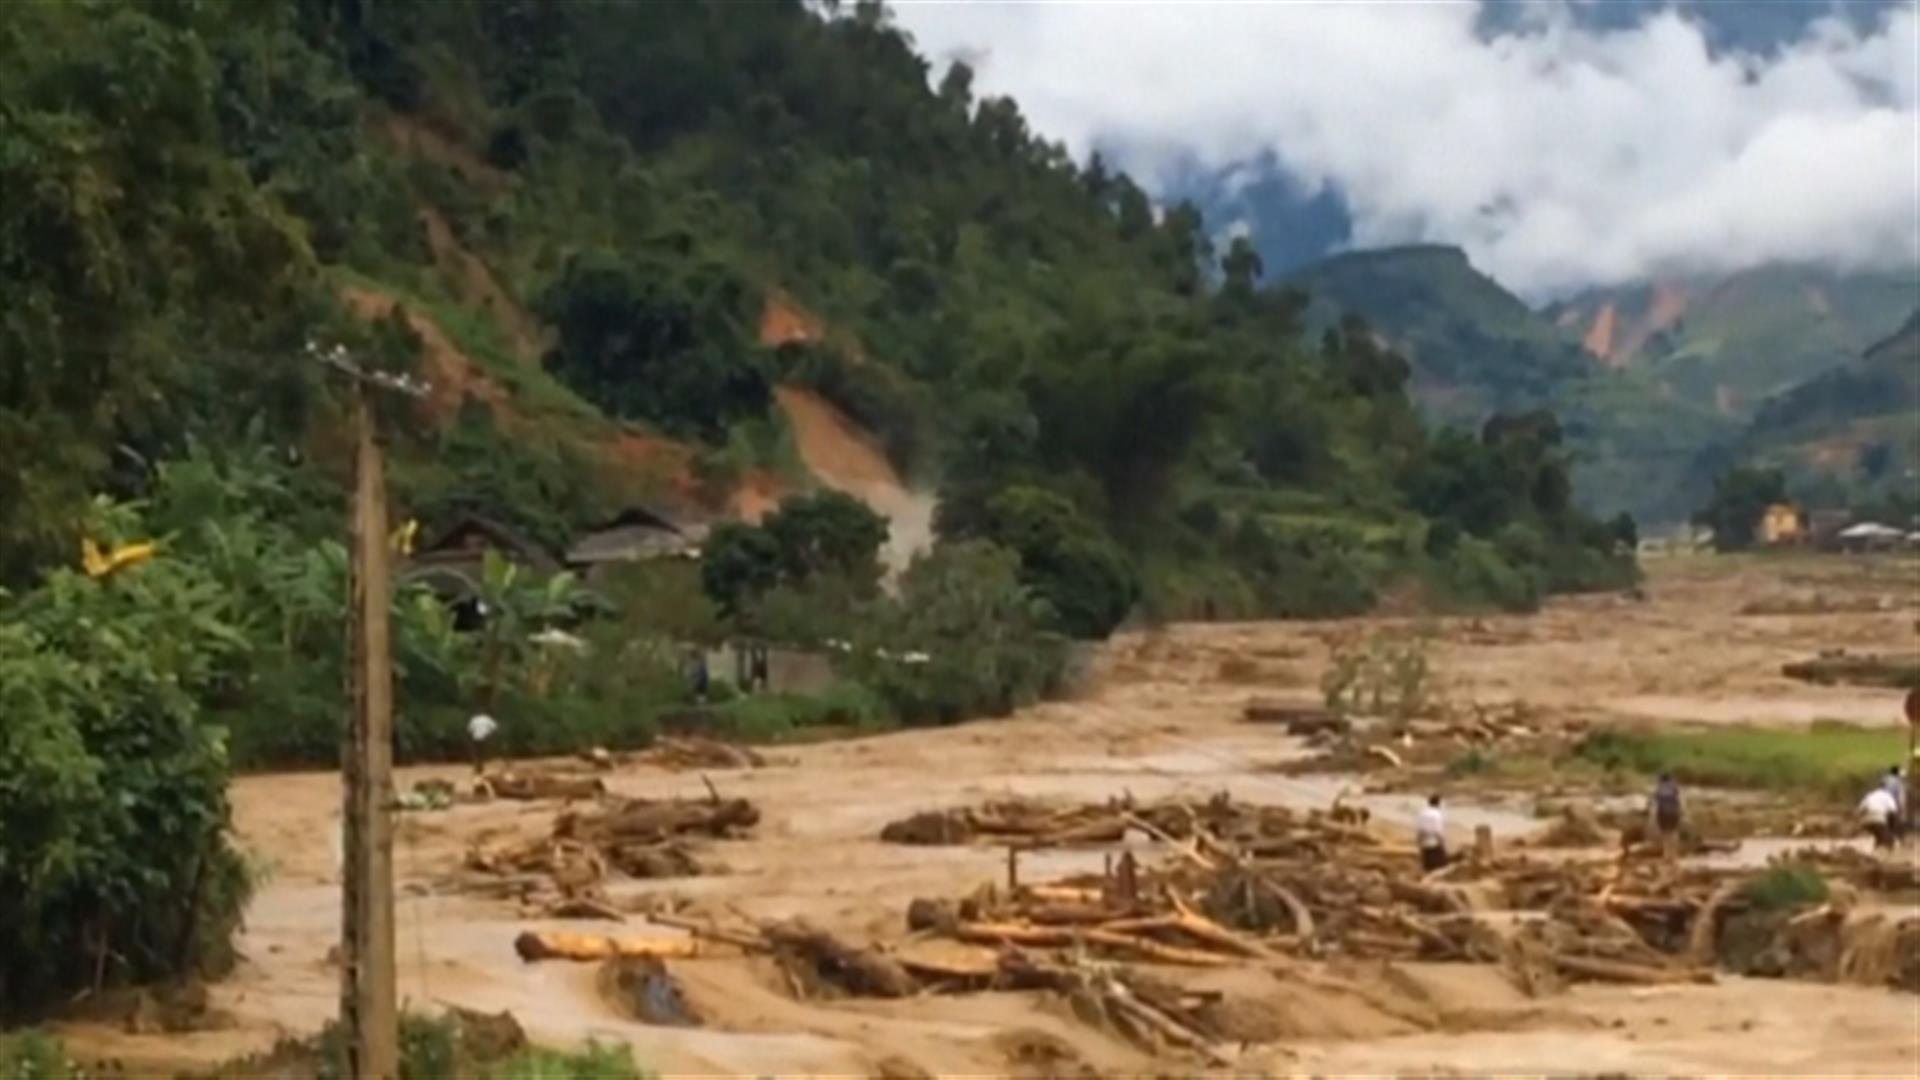 b56142f6b2c ANT1 internet world | Εικόνες καταστροφής από τις φονικές πλημμύρες στο  Βιετνάμ (βίντεο)